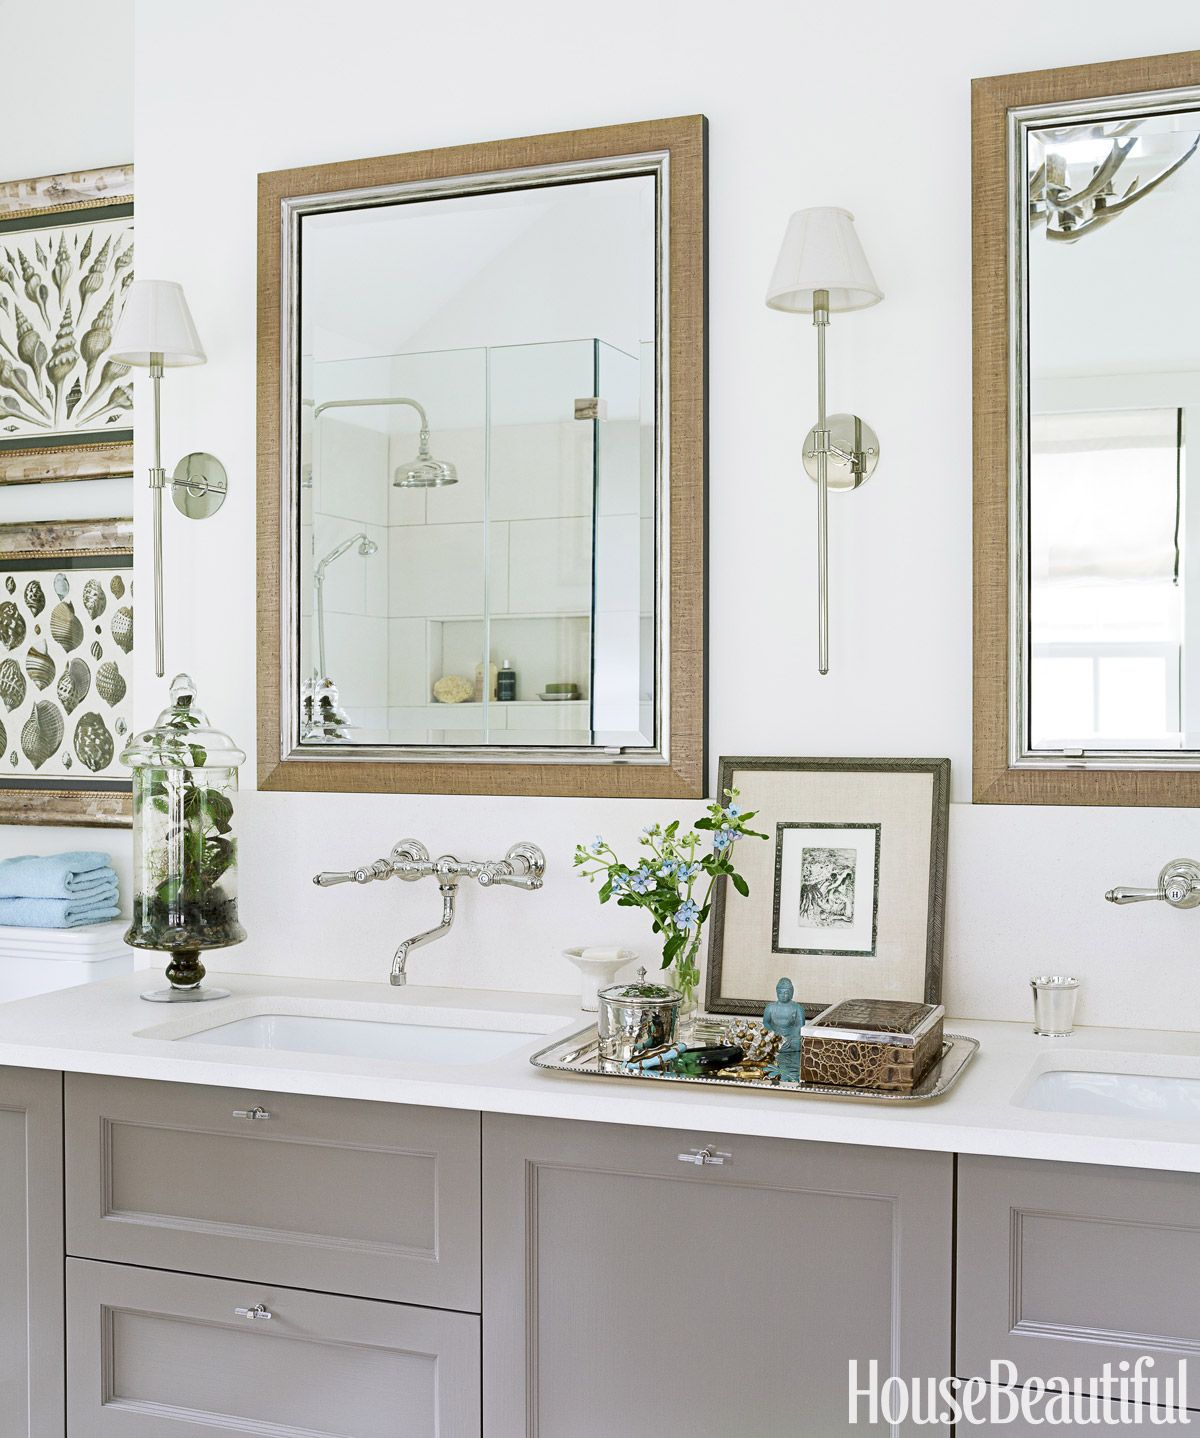 Belgian Style Bathroom - Calm Bathroom Decorating Ideas